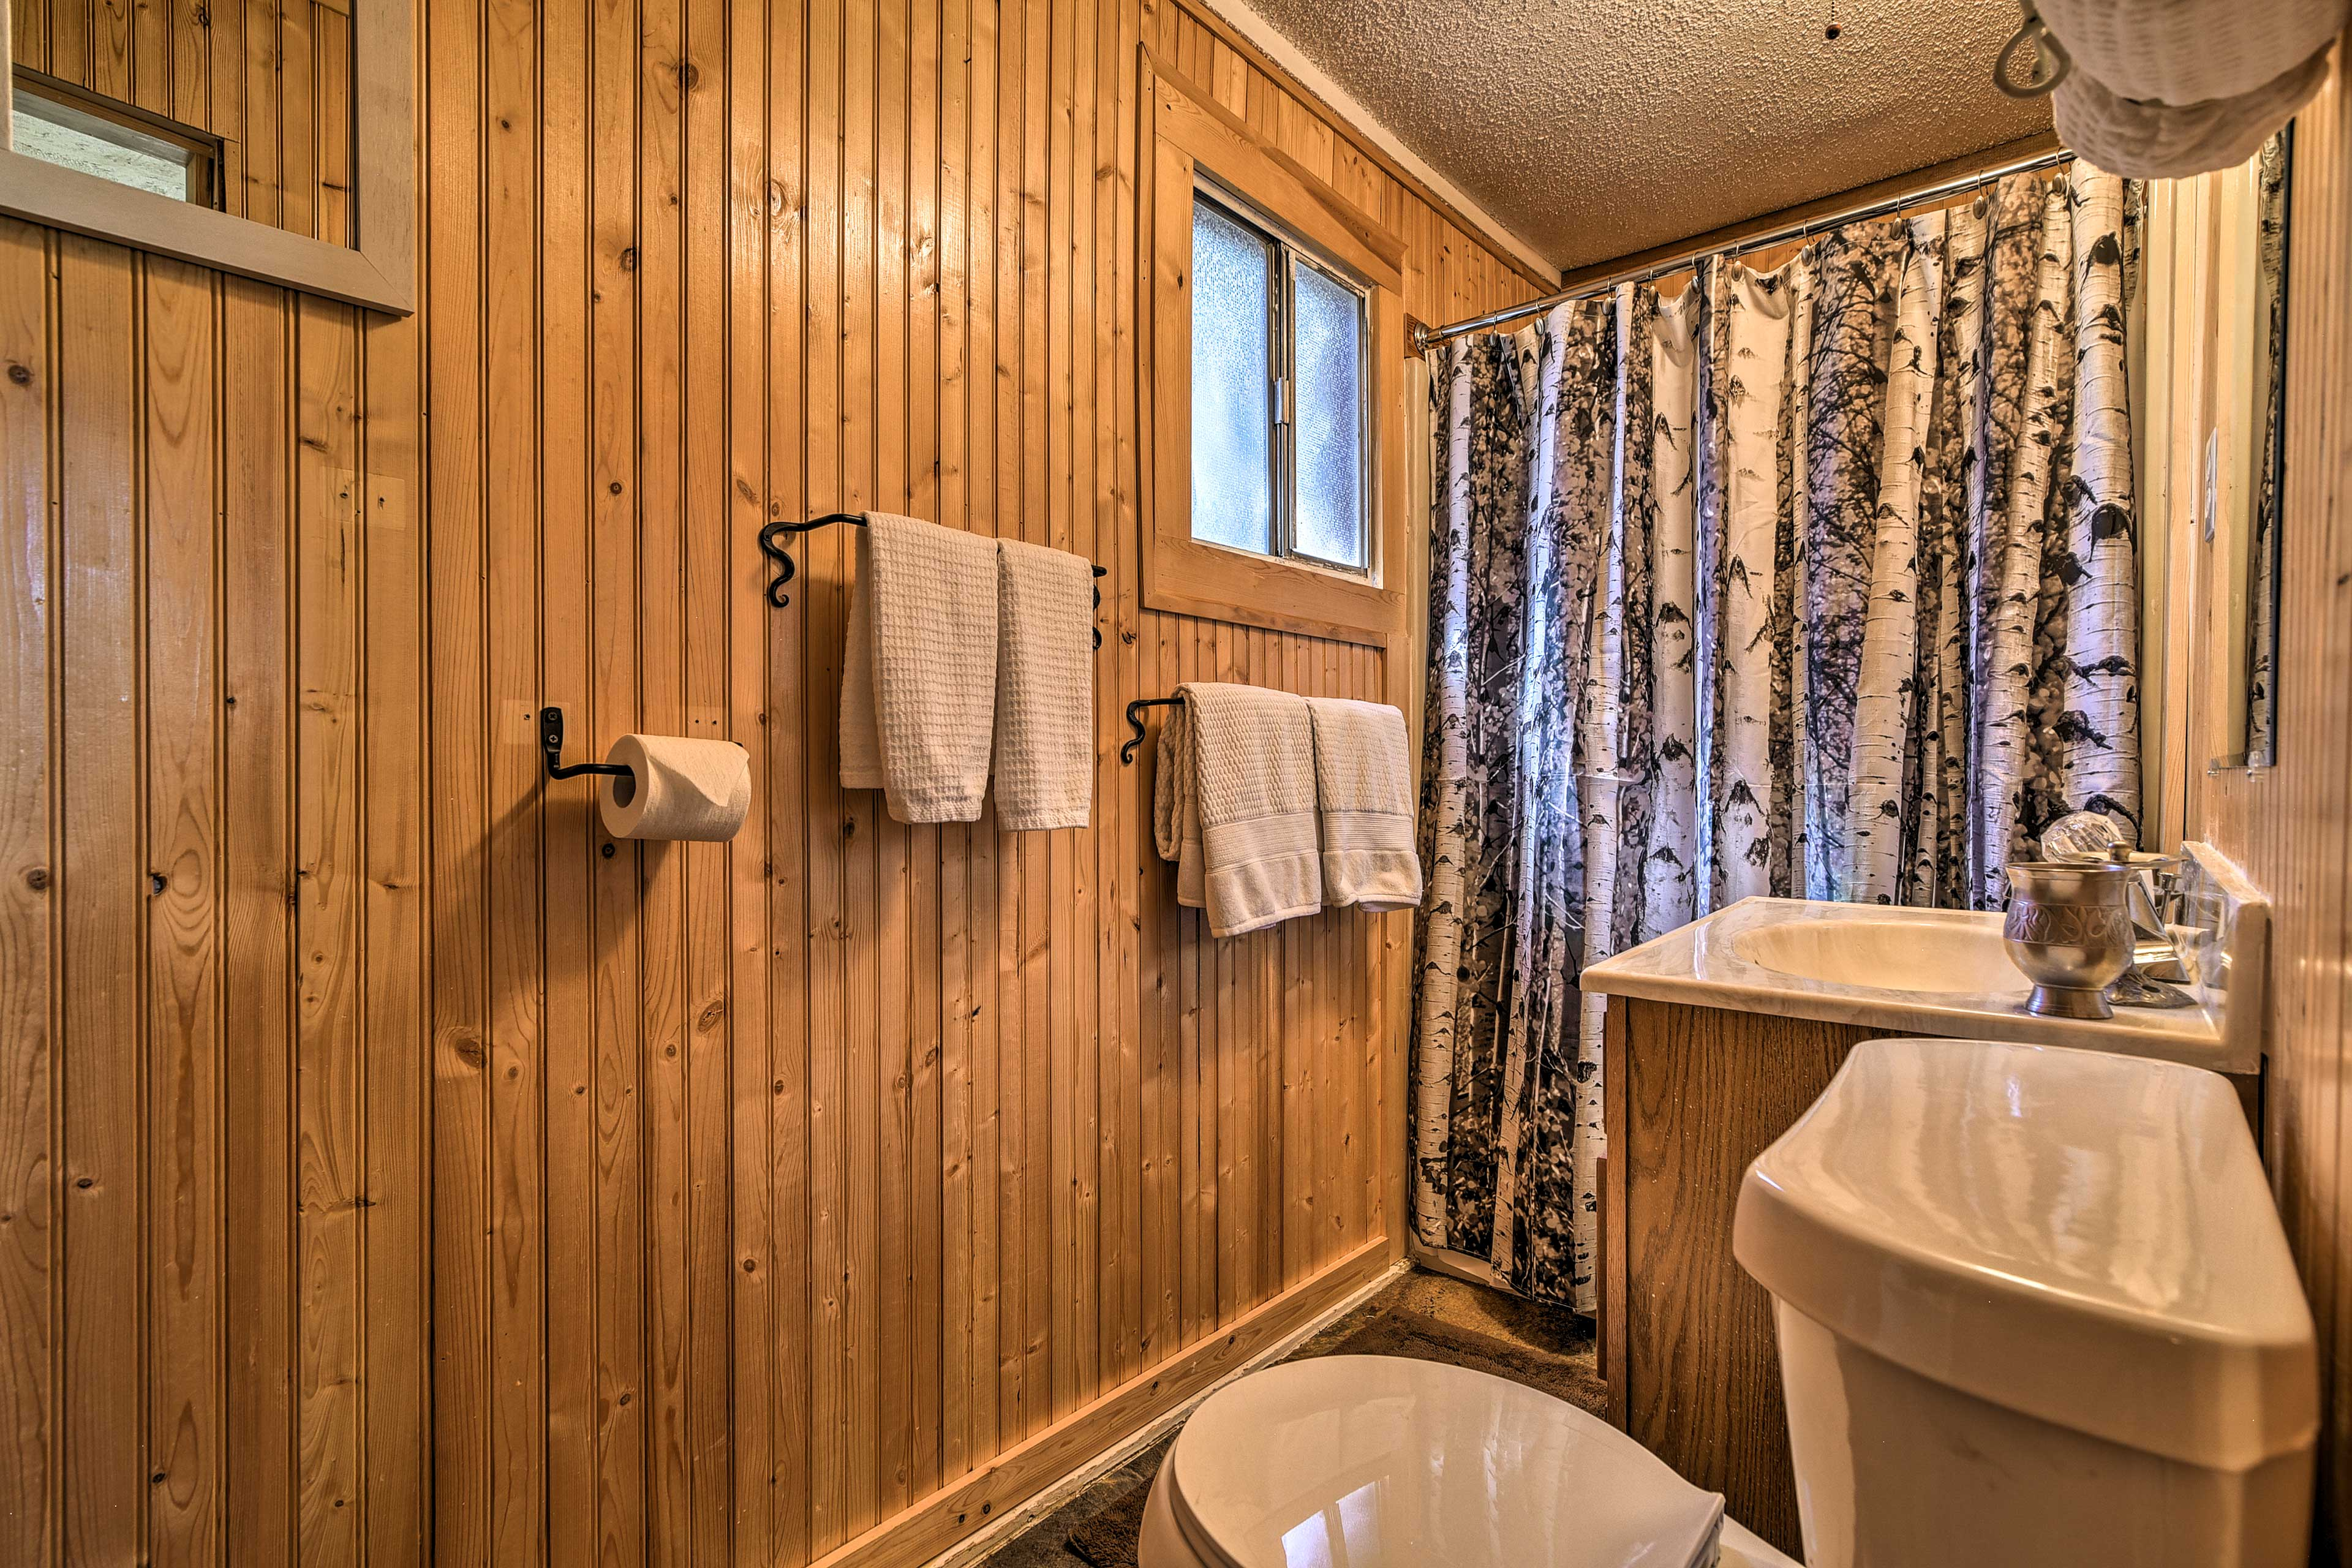 The cabin has 1 bathroom.